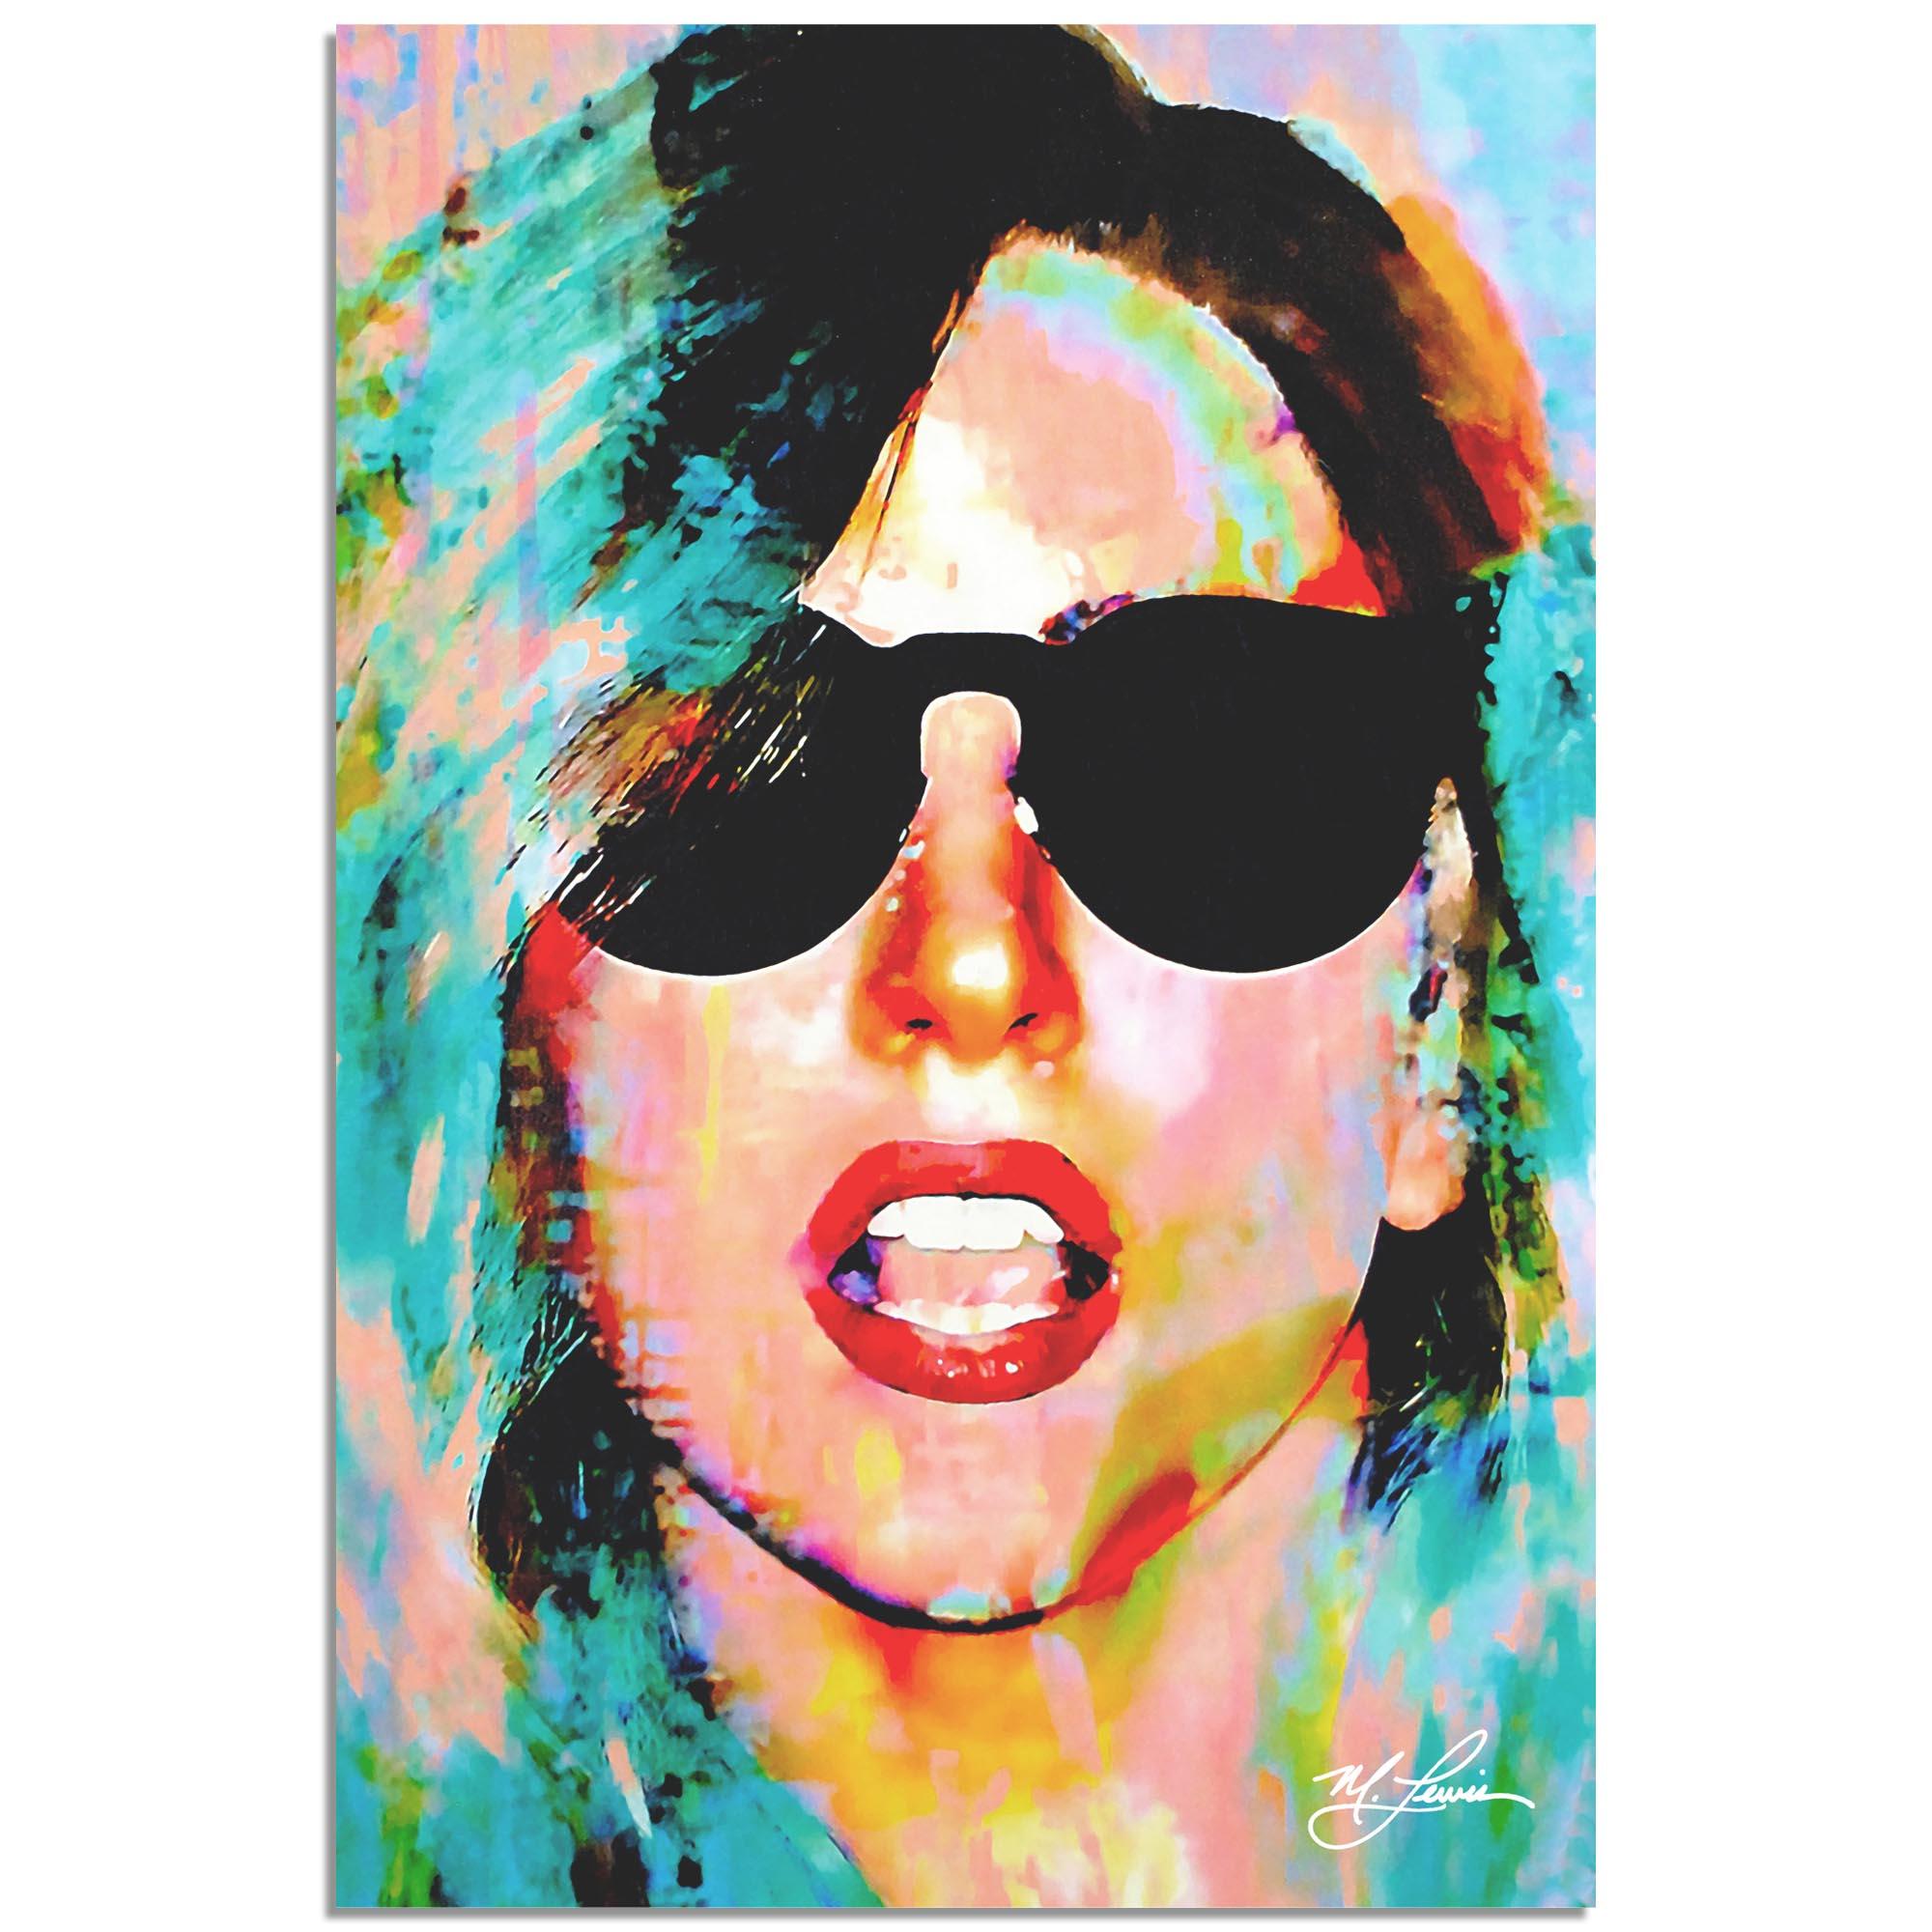 Mark Lewis 'Lady Gaga Everyday Art' 22in x 32in Celebrity Pop Art on Metal or Plexiglass